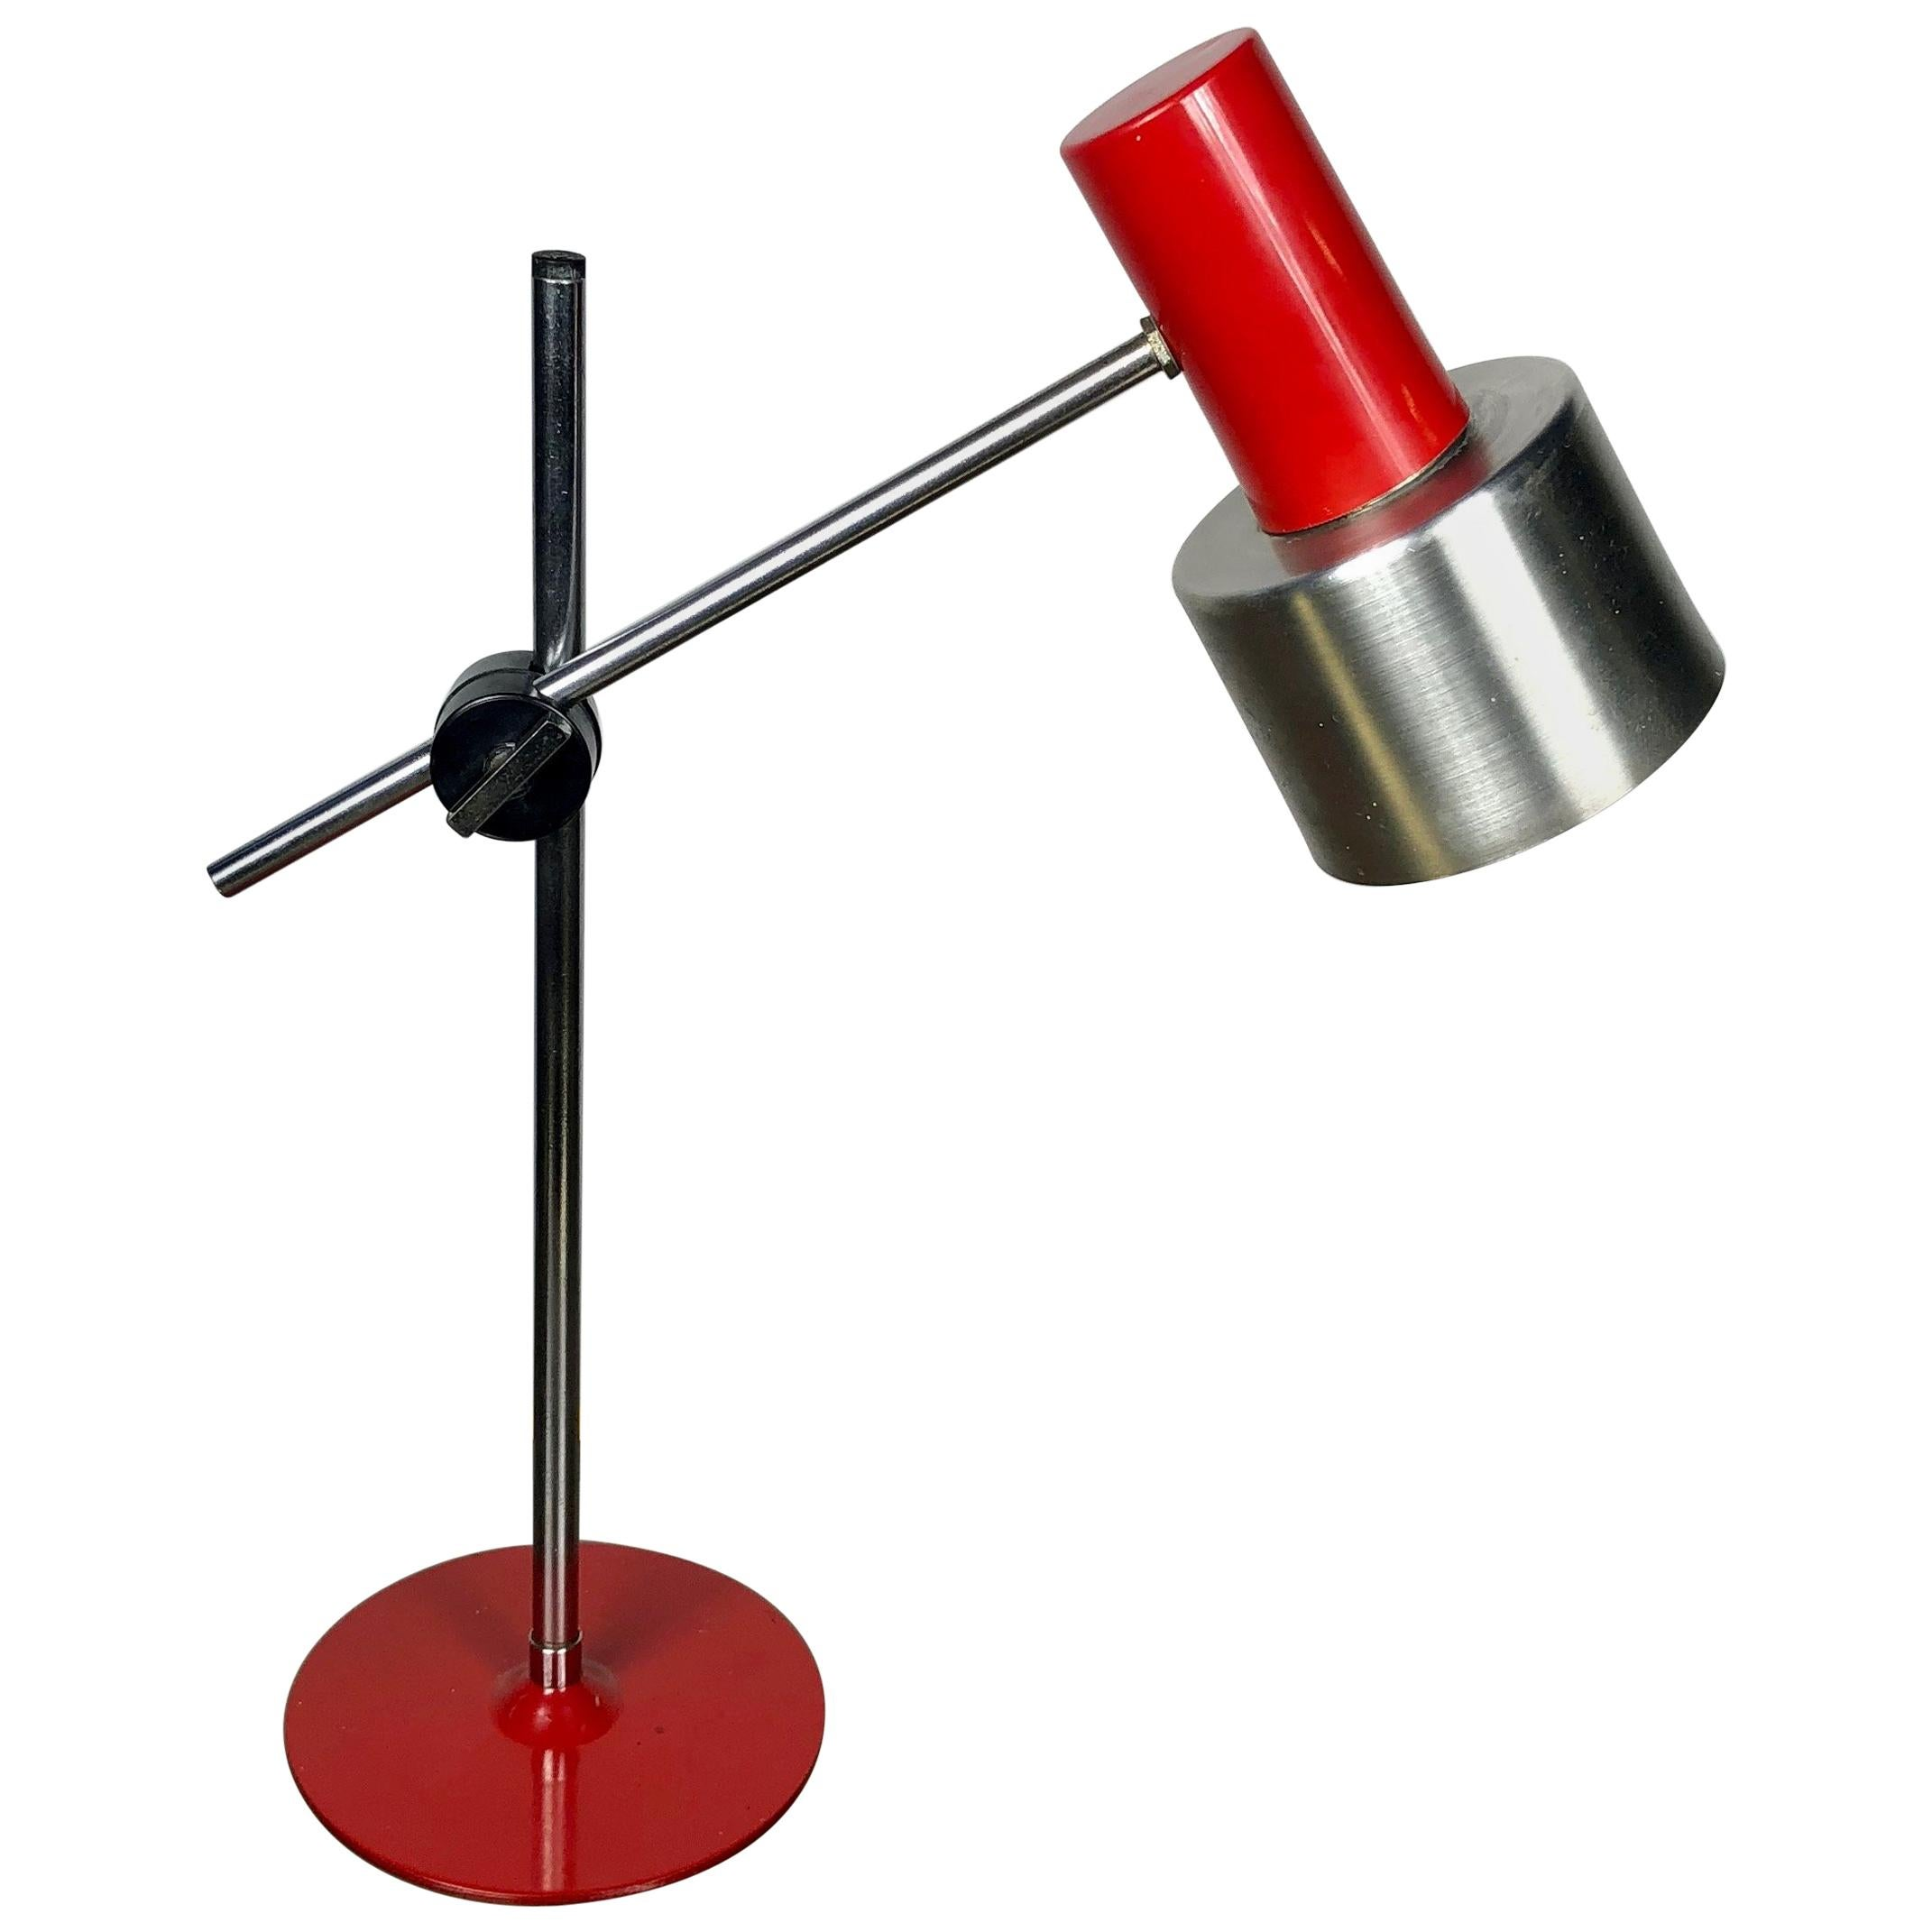 Stilnovo Adjustable Table Lamp Red, Metal, Aluminium, Italy Lighting, 1960s